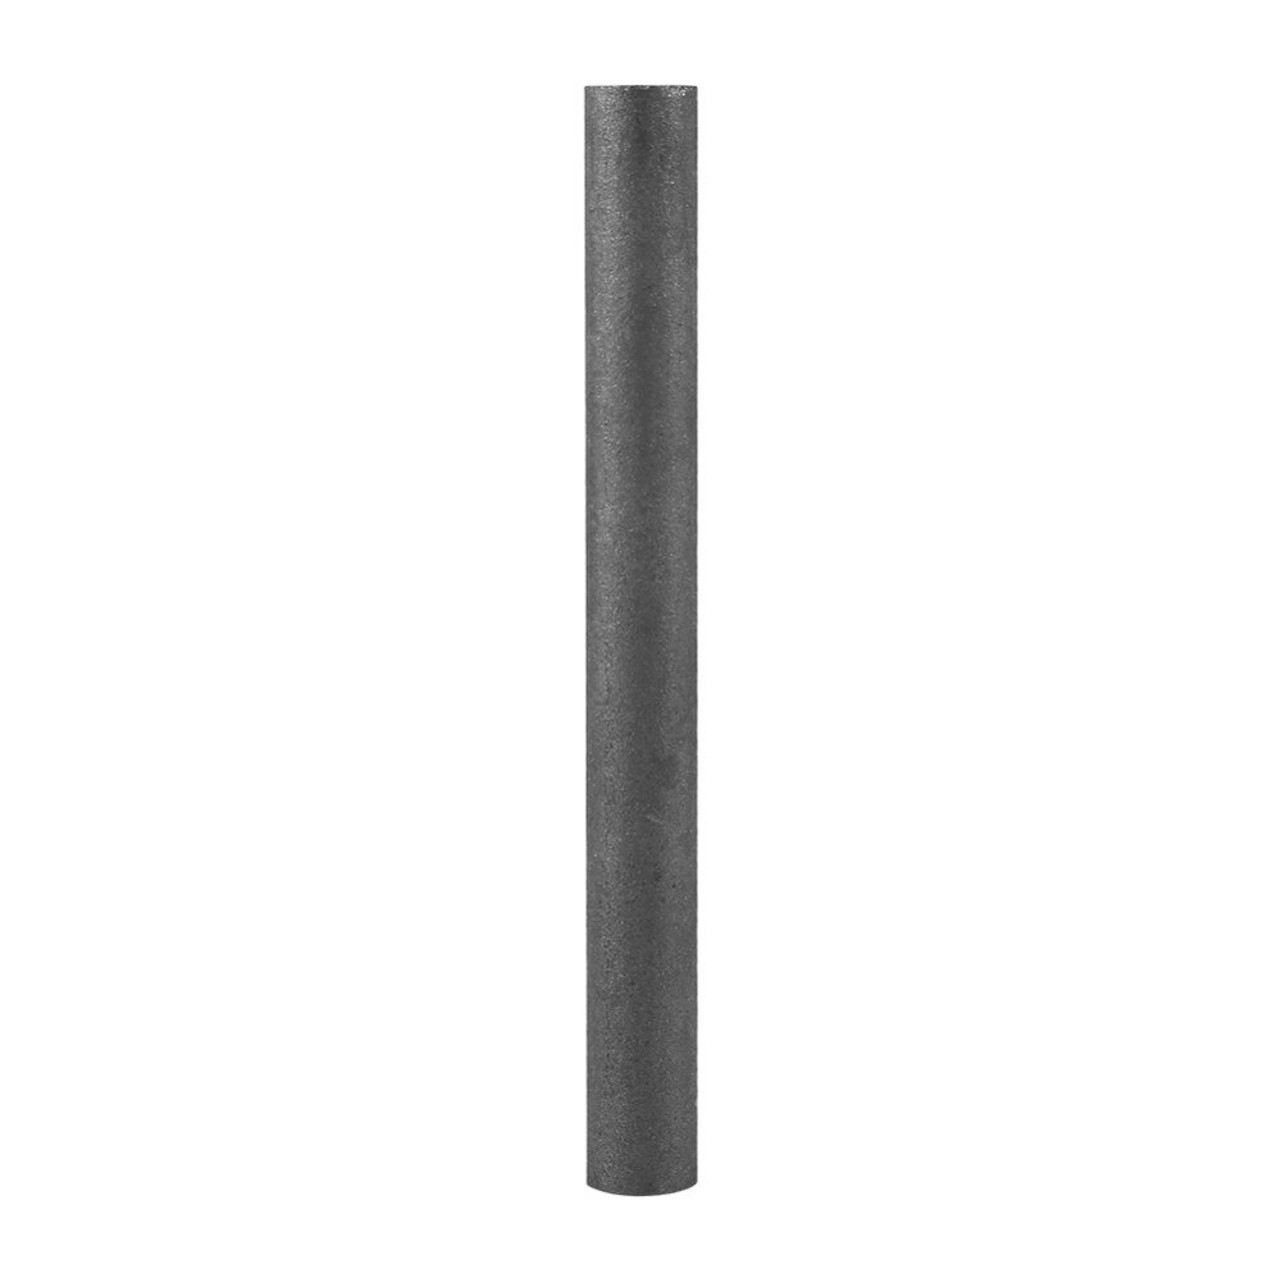 Aigend Graphite Rod 5pcs 99.9/% Graphite Electrode Cylinder Rod Good Electrical Conductivity Graphite Rod Length 100mm Diameter 10mm